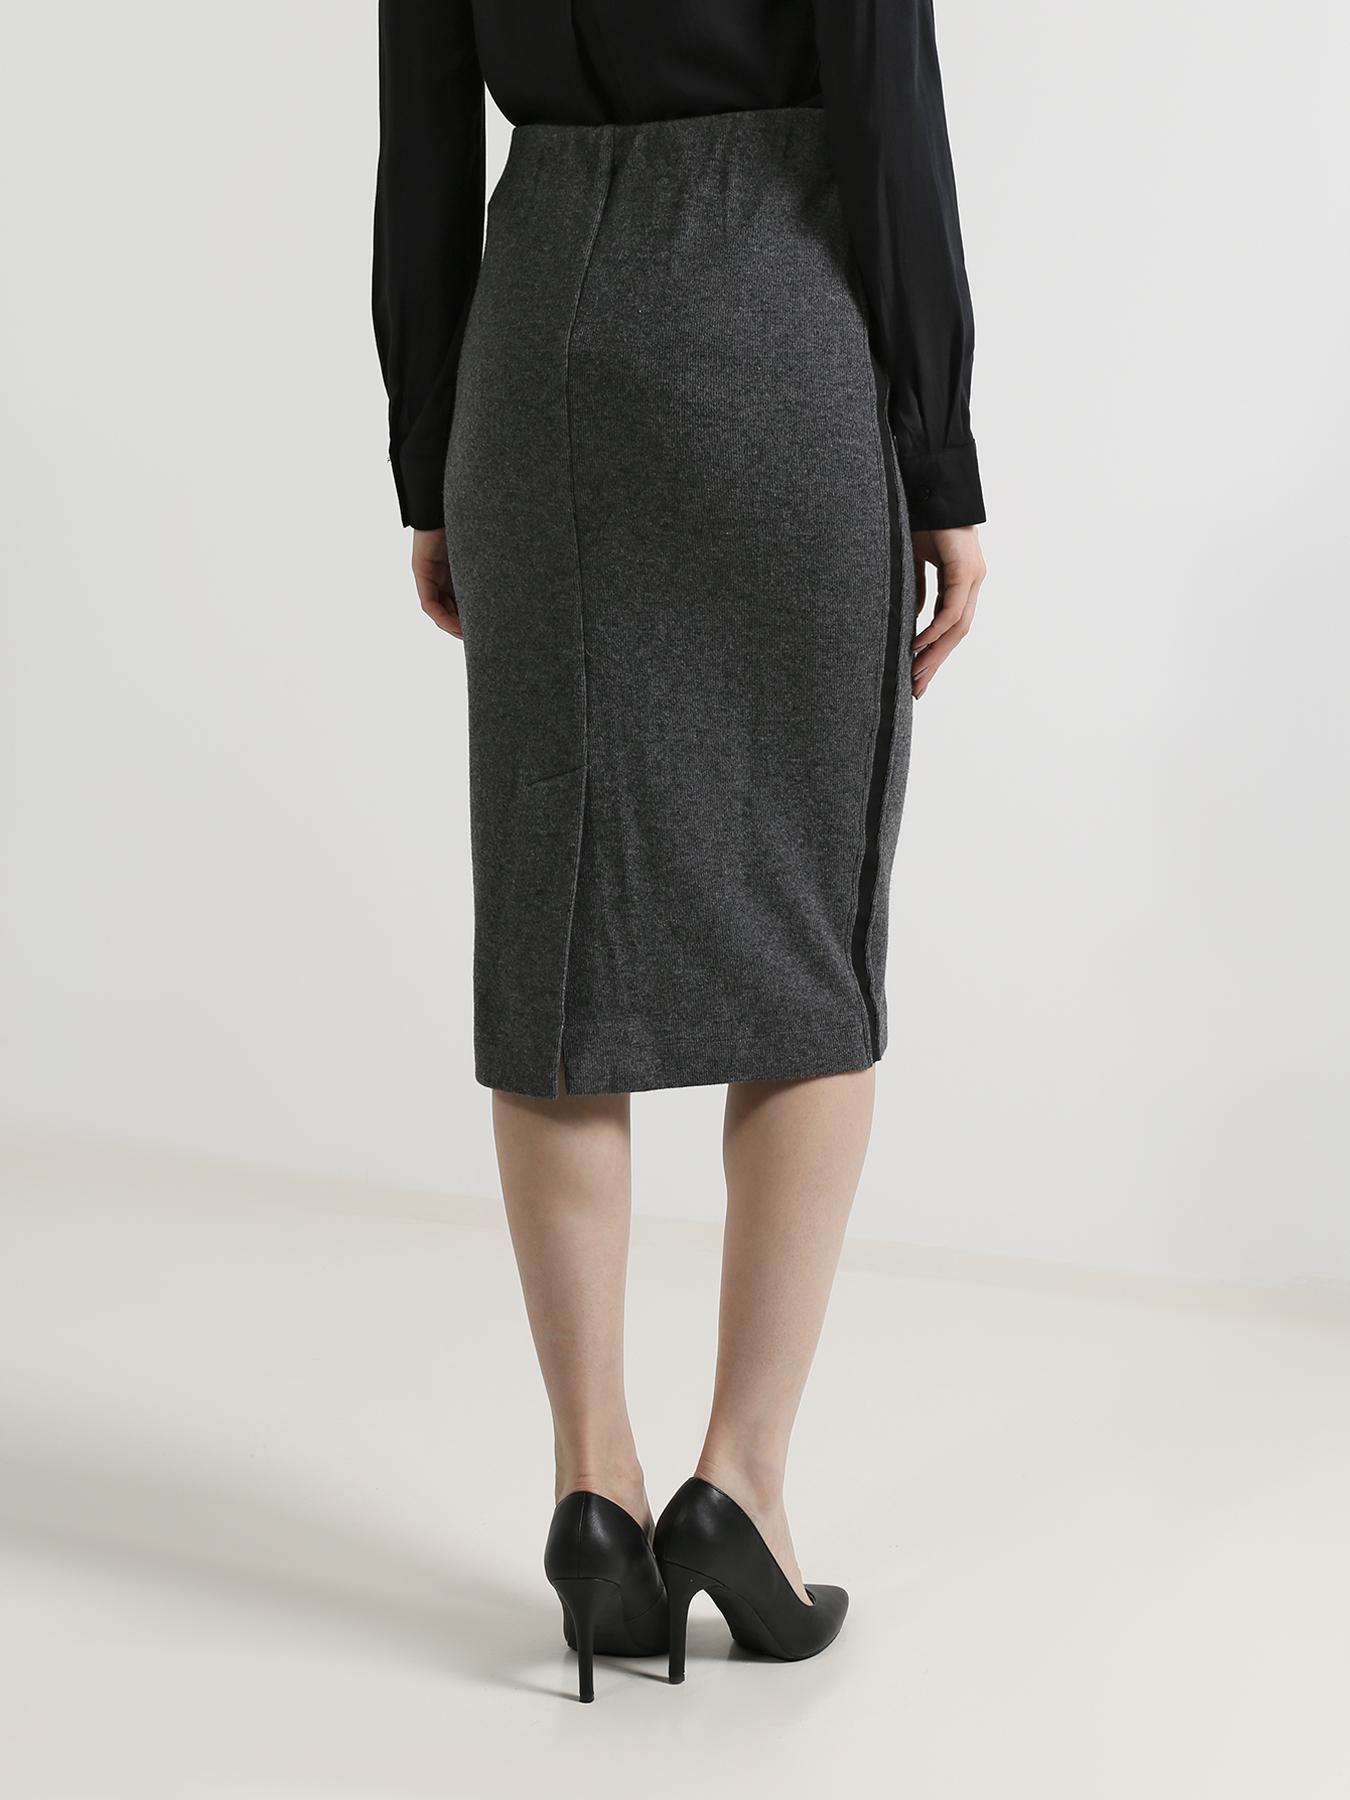 BOSS Женская юбка Tighty 357906-041 Фото 2